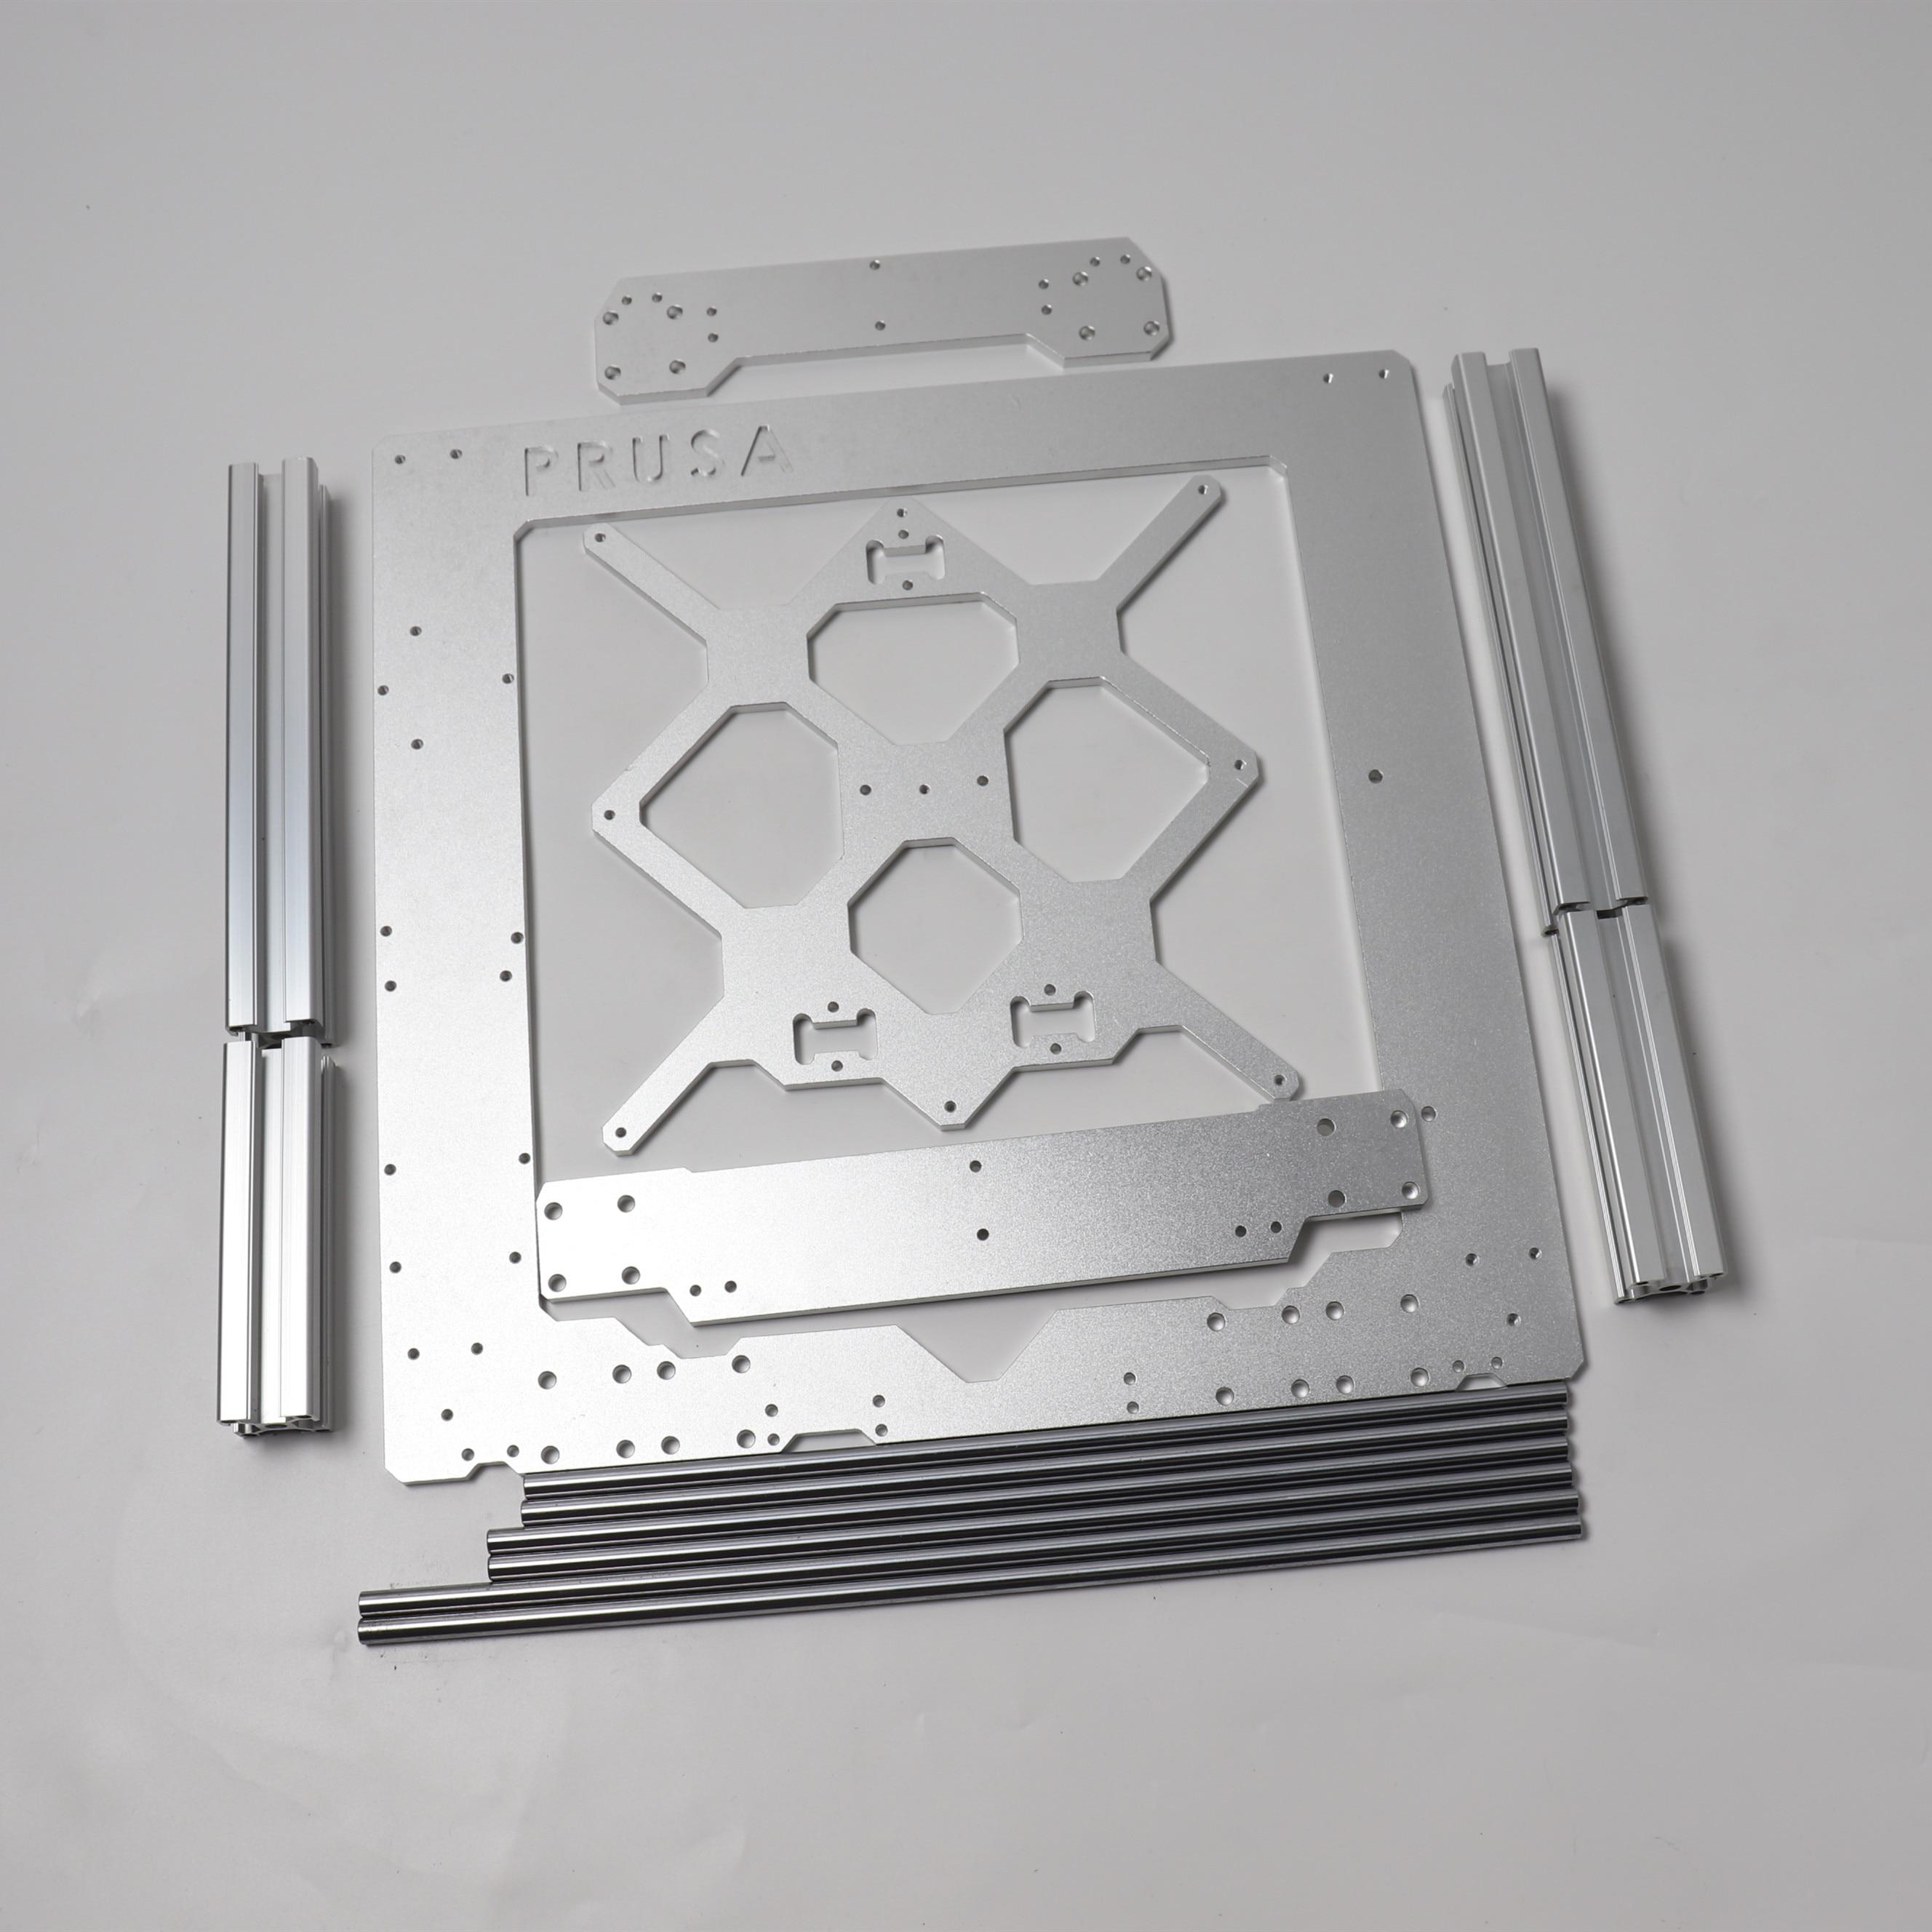 Prusa i3 MK3/MK3S 3d طابعة الألومنيوم إطار 3030 وملامح 8 مللي متر OD السلس قضبان كيت